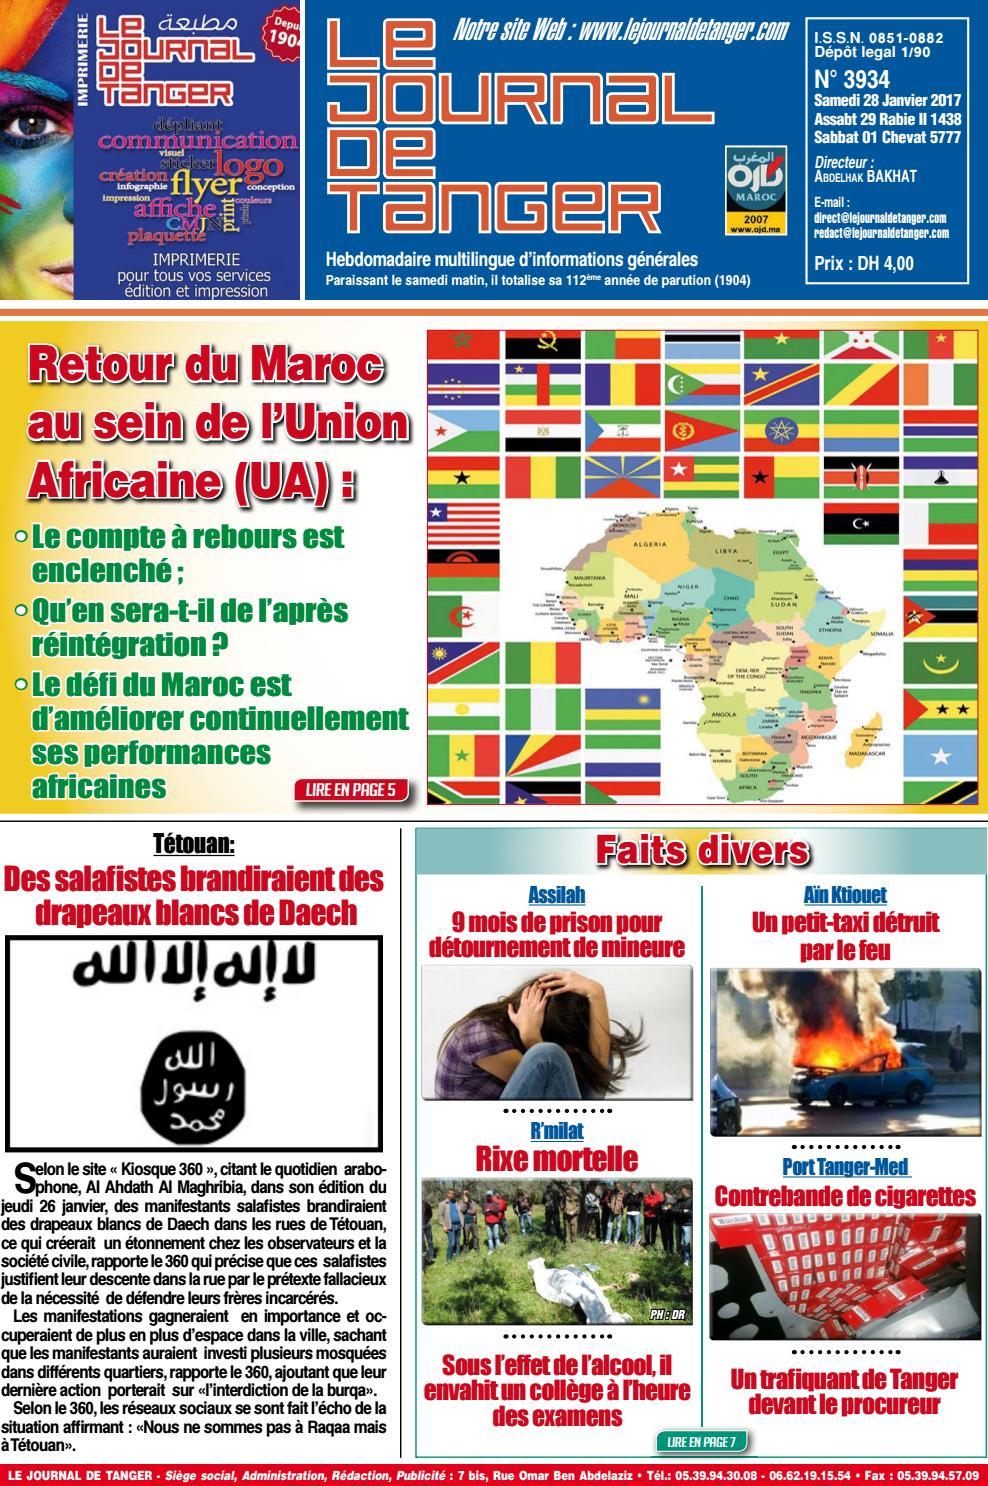 dbc3b6ee9 Le journal de Tanger 28 janvier 2017 by Le Journal de Tanger - issuu